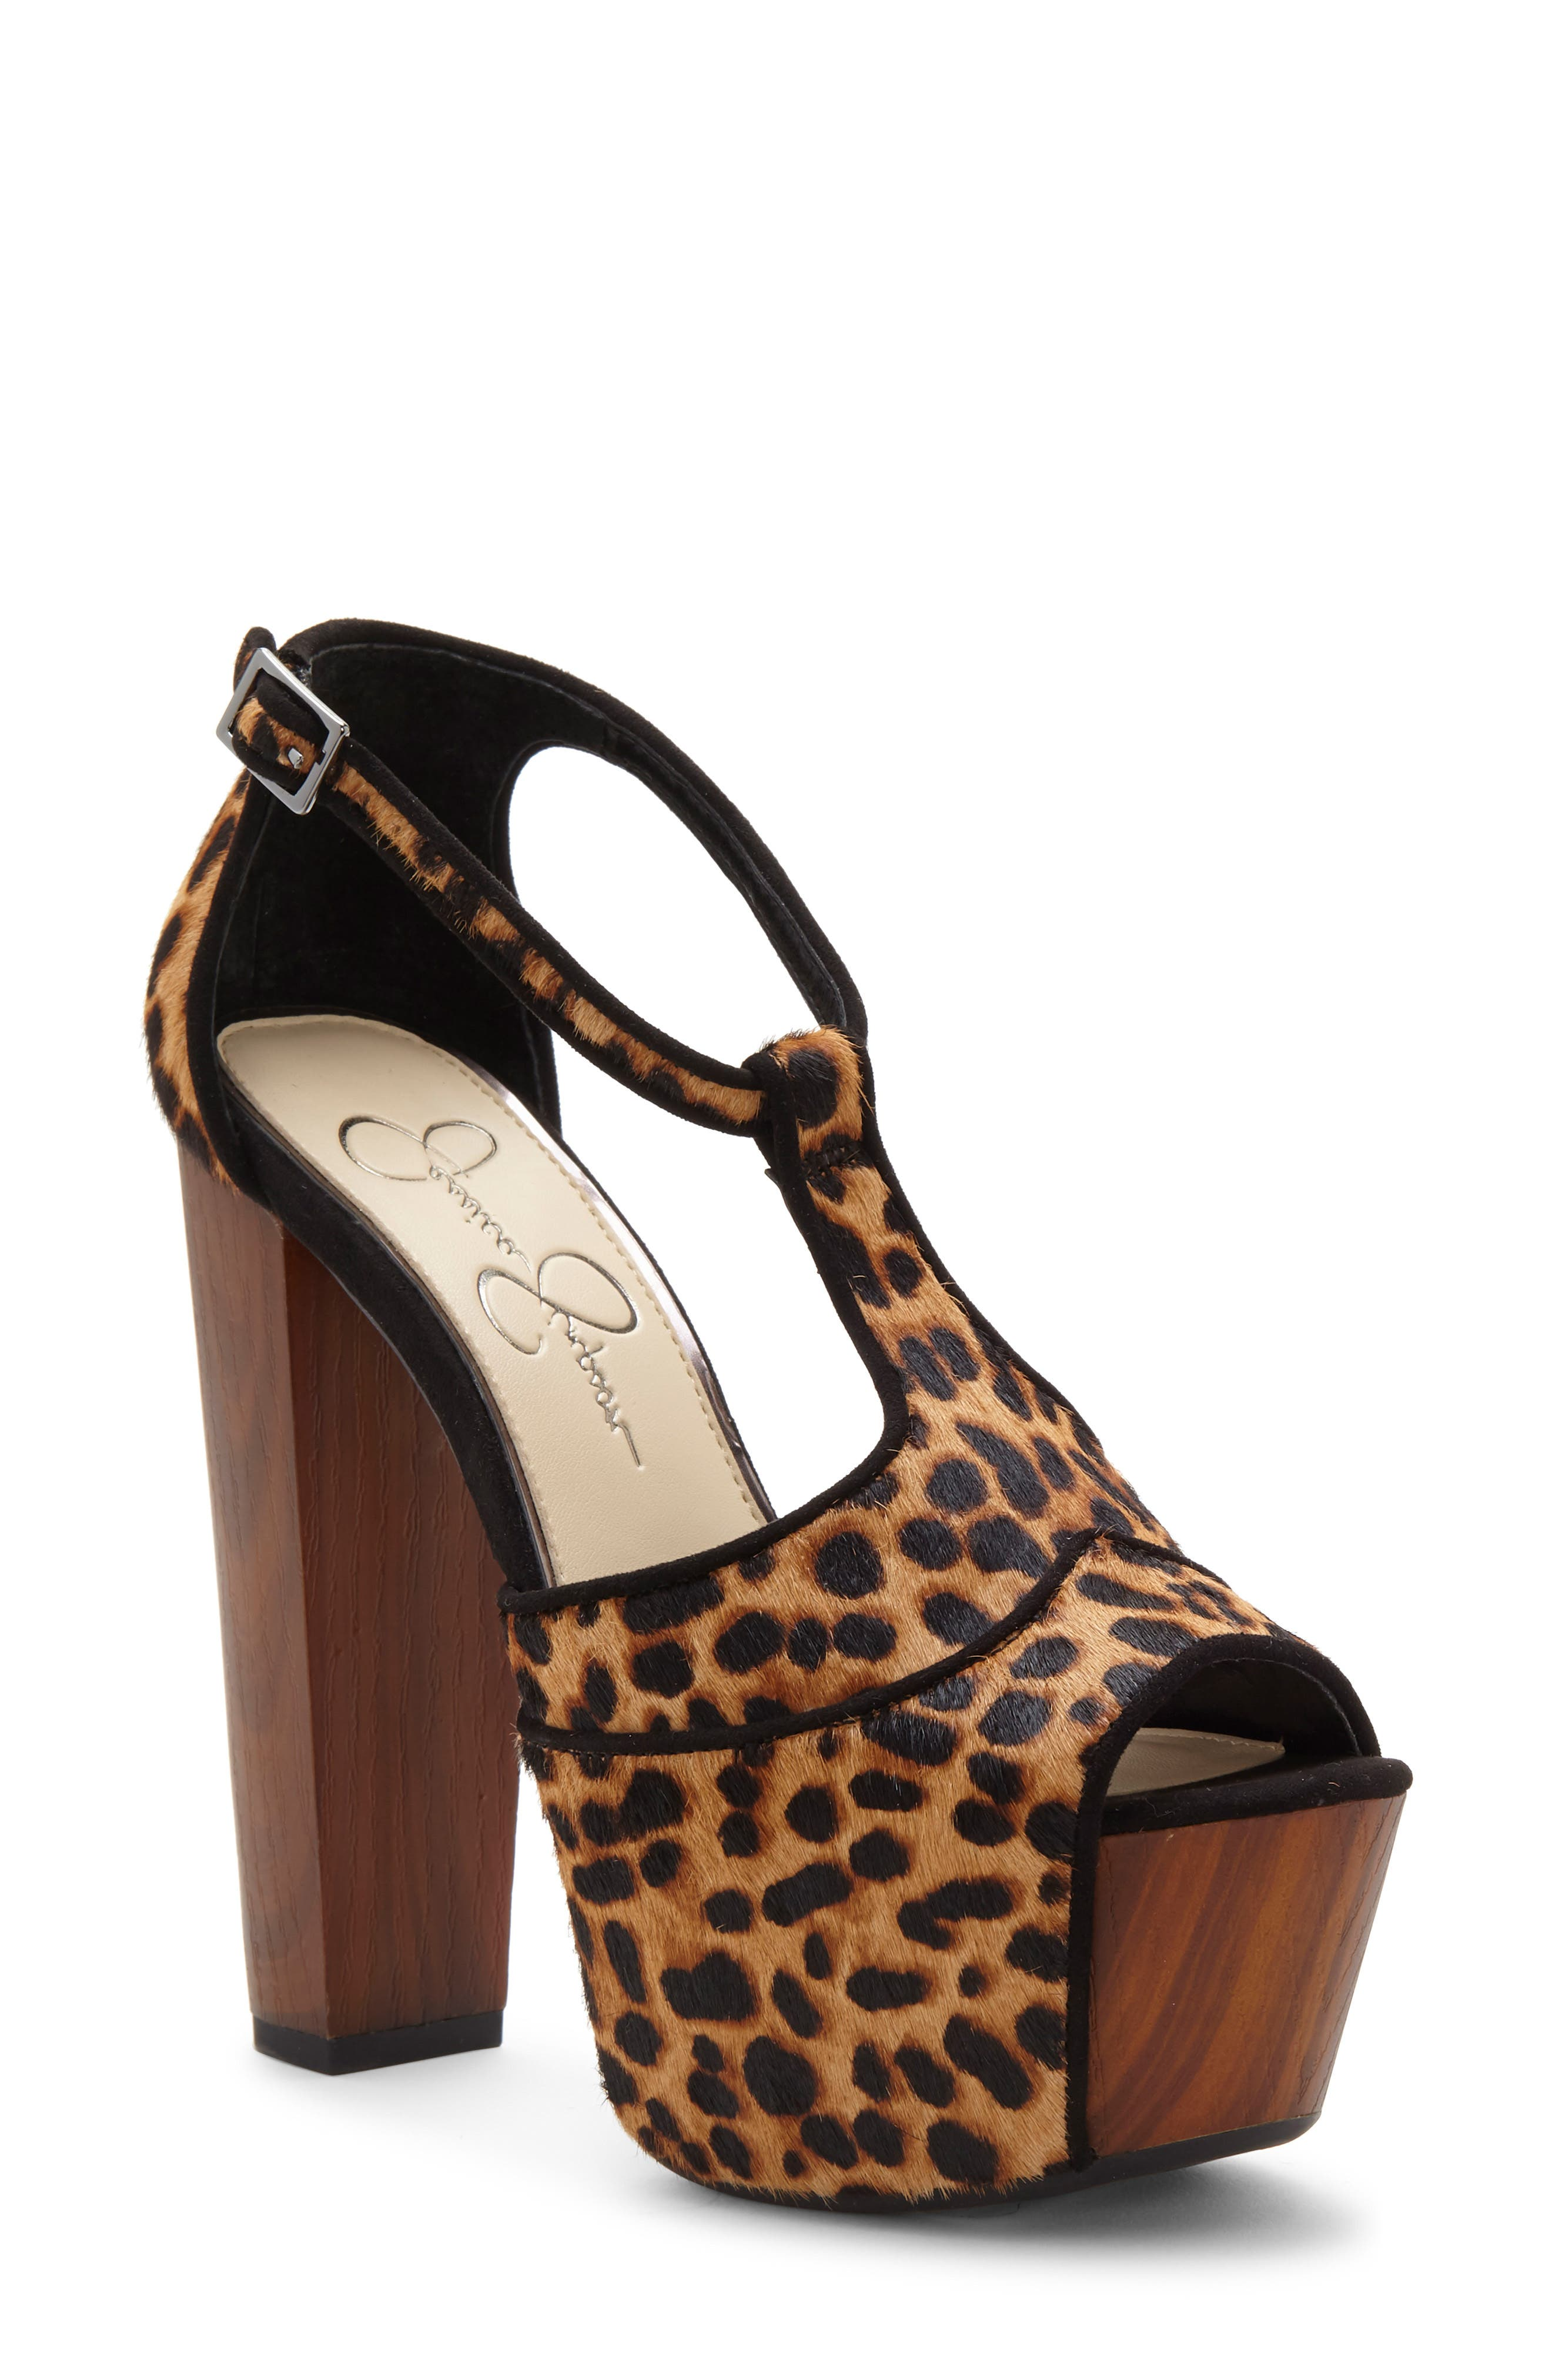 JESSICA SIMPSON, 'Dany' Genuine Calf Hair Sandal, Main thumbnail 1, color, NATURAL/NATURAL CALF HAIR